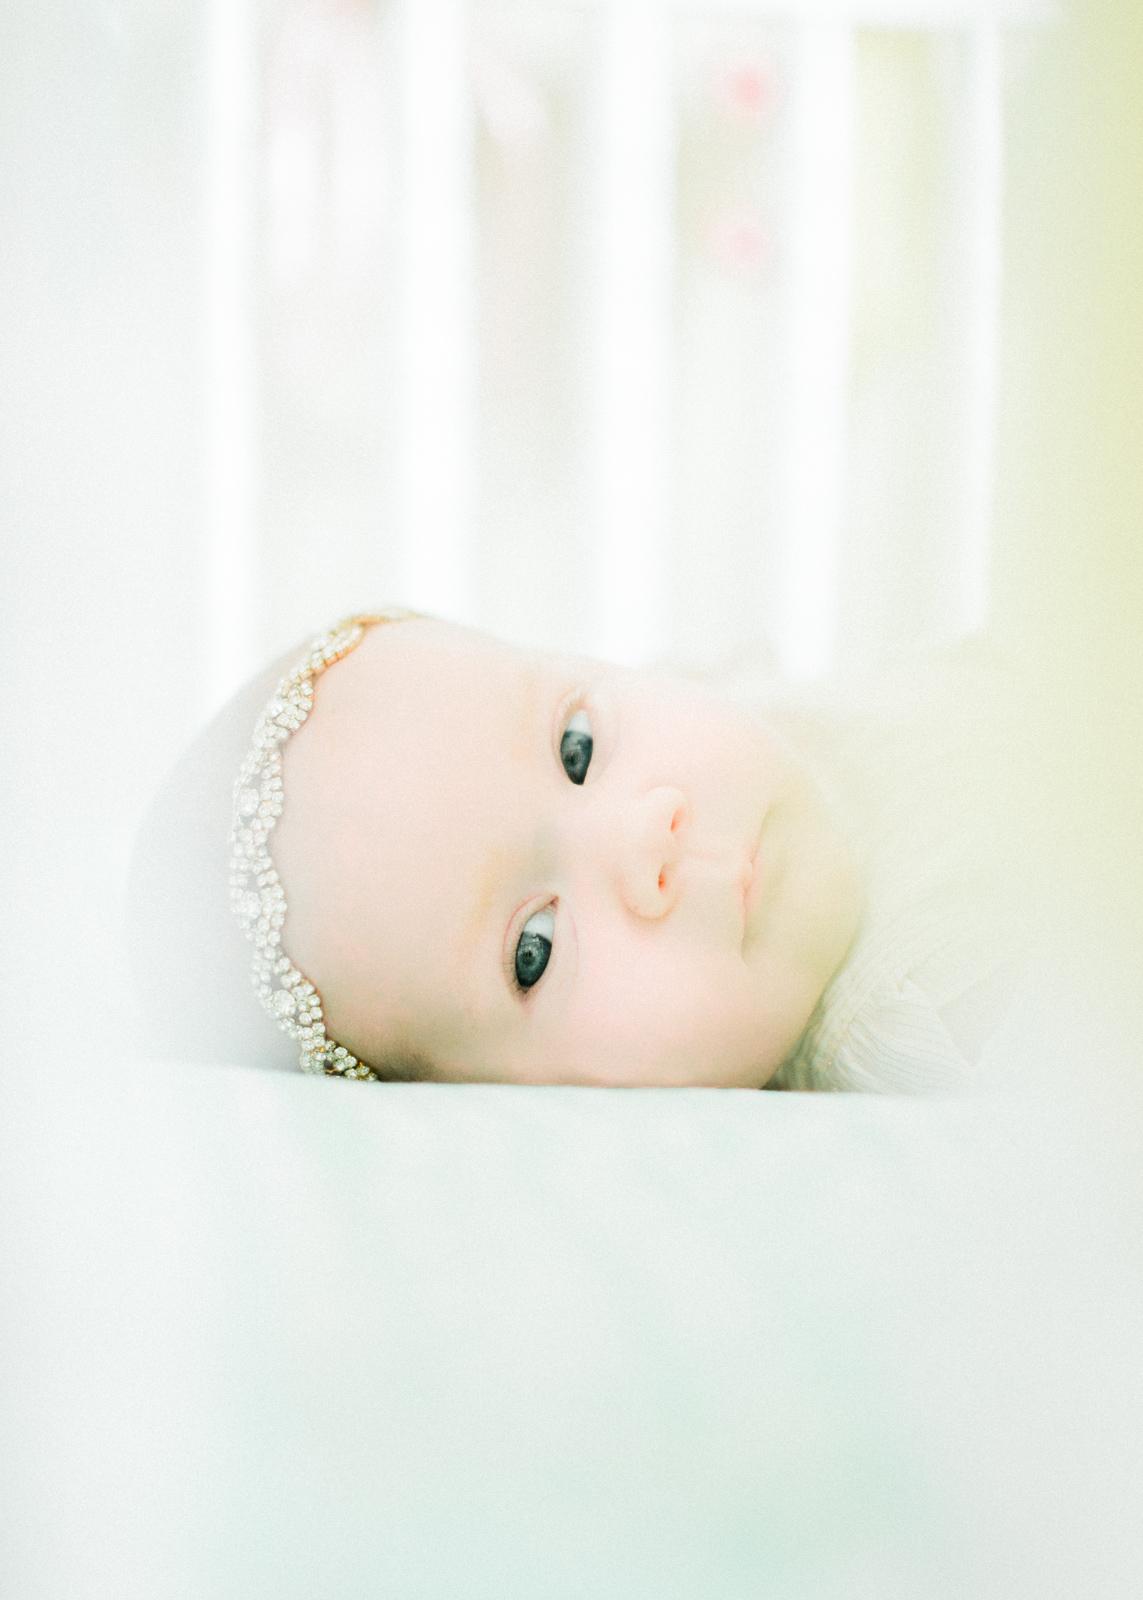 boise-meridian-idaho-newborn-photographer-7103.jpg